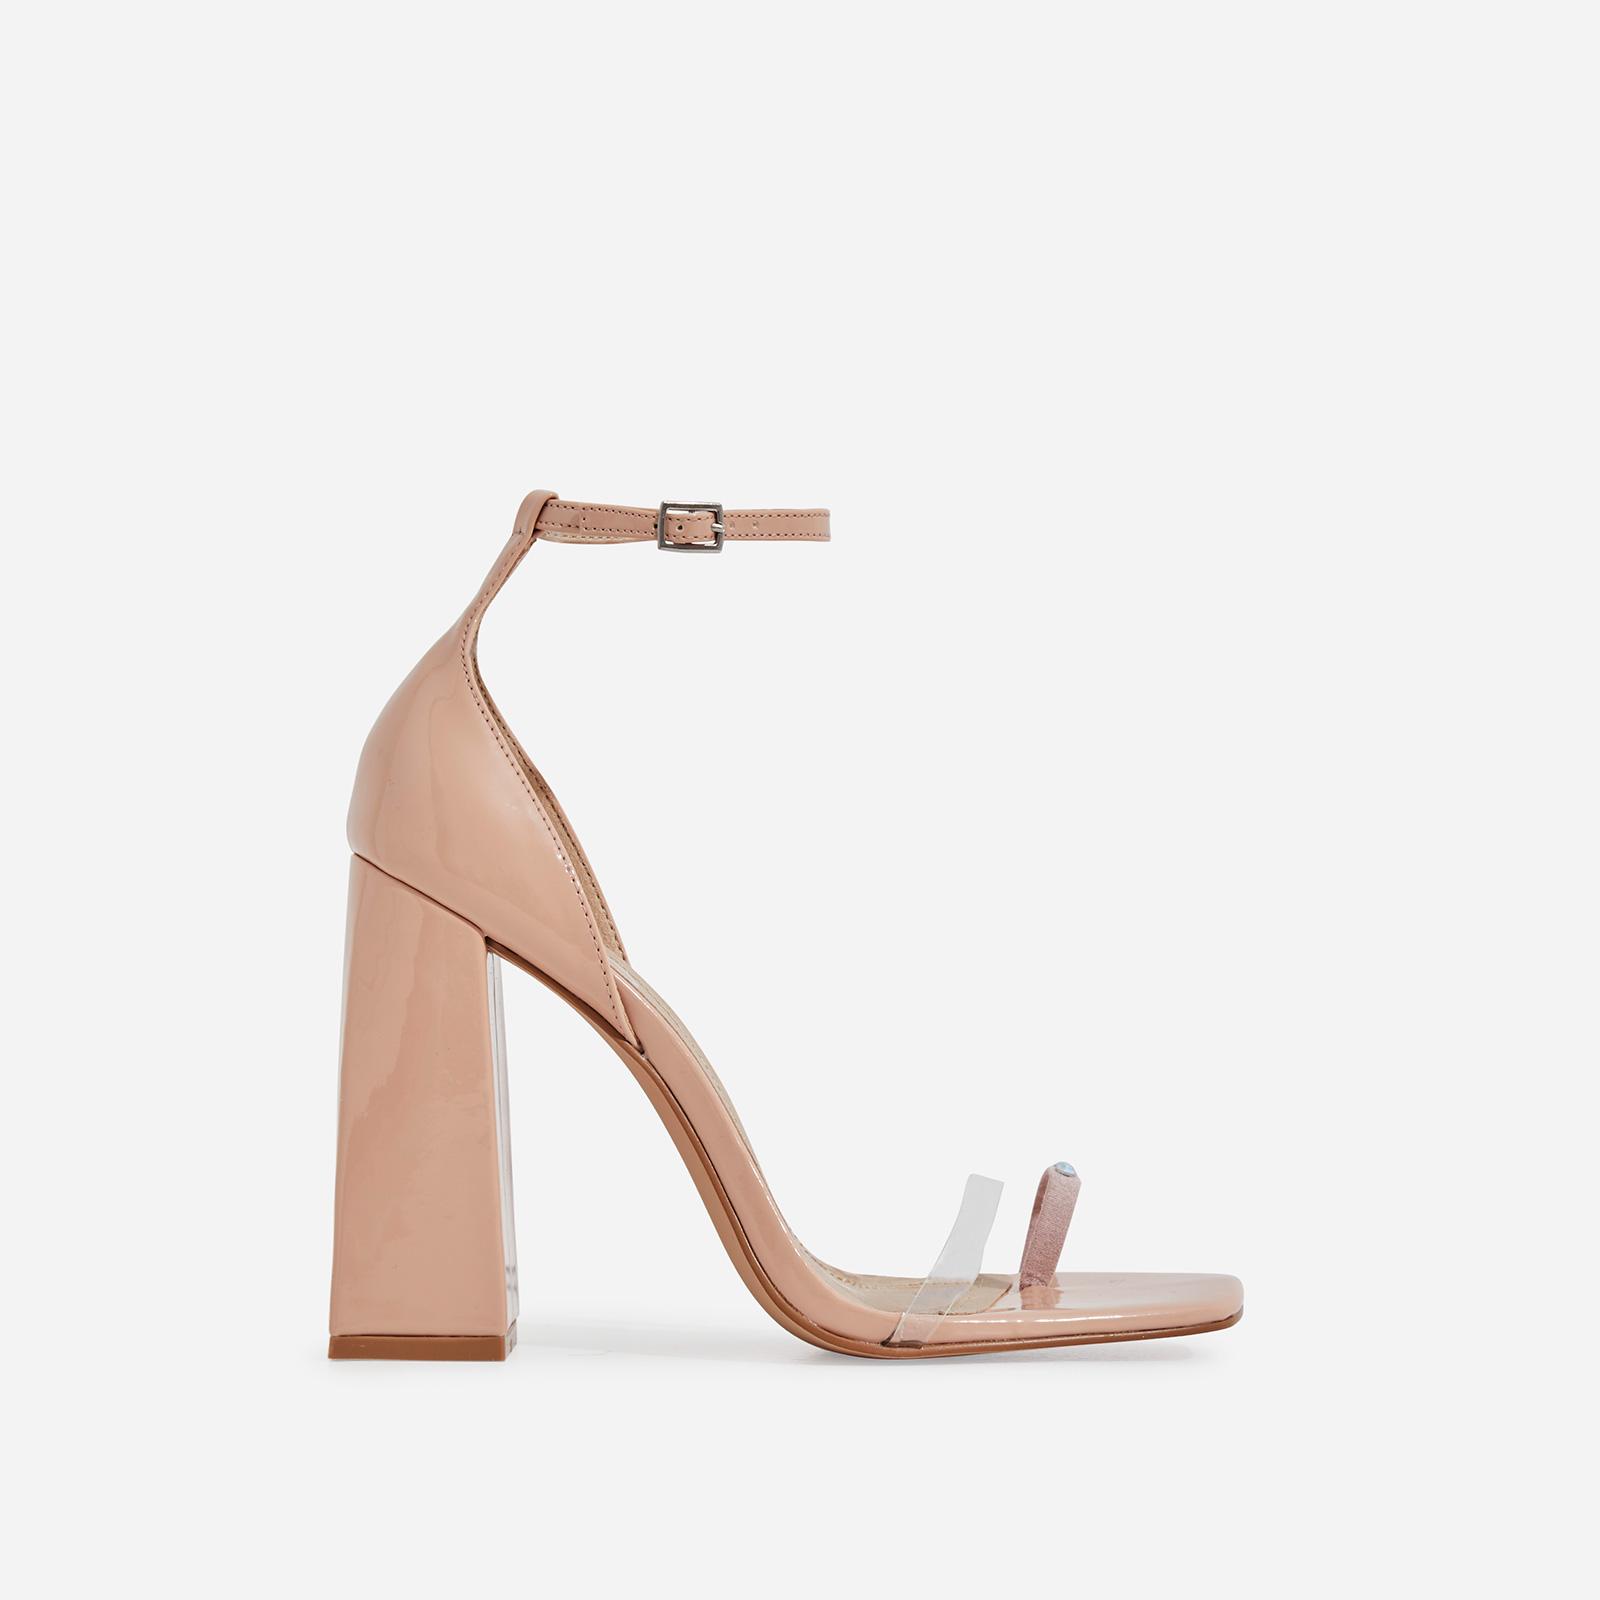 Perch Diamante Detail Strap Square Toe Perspex Flared Block Heel In Nude Patent